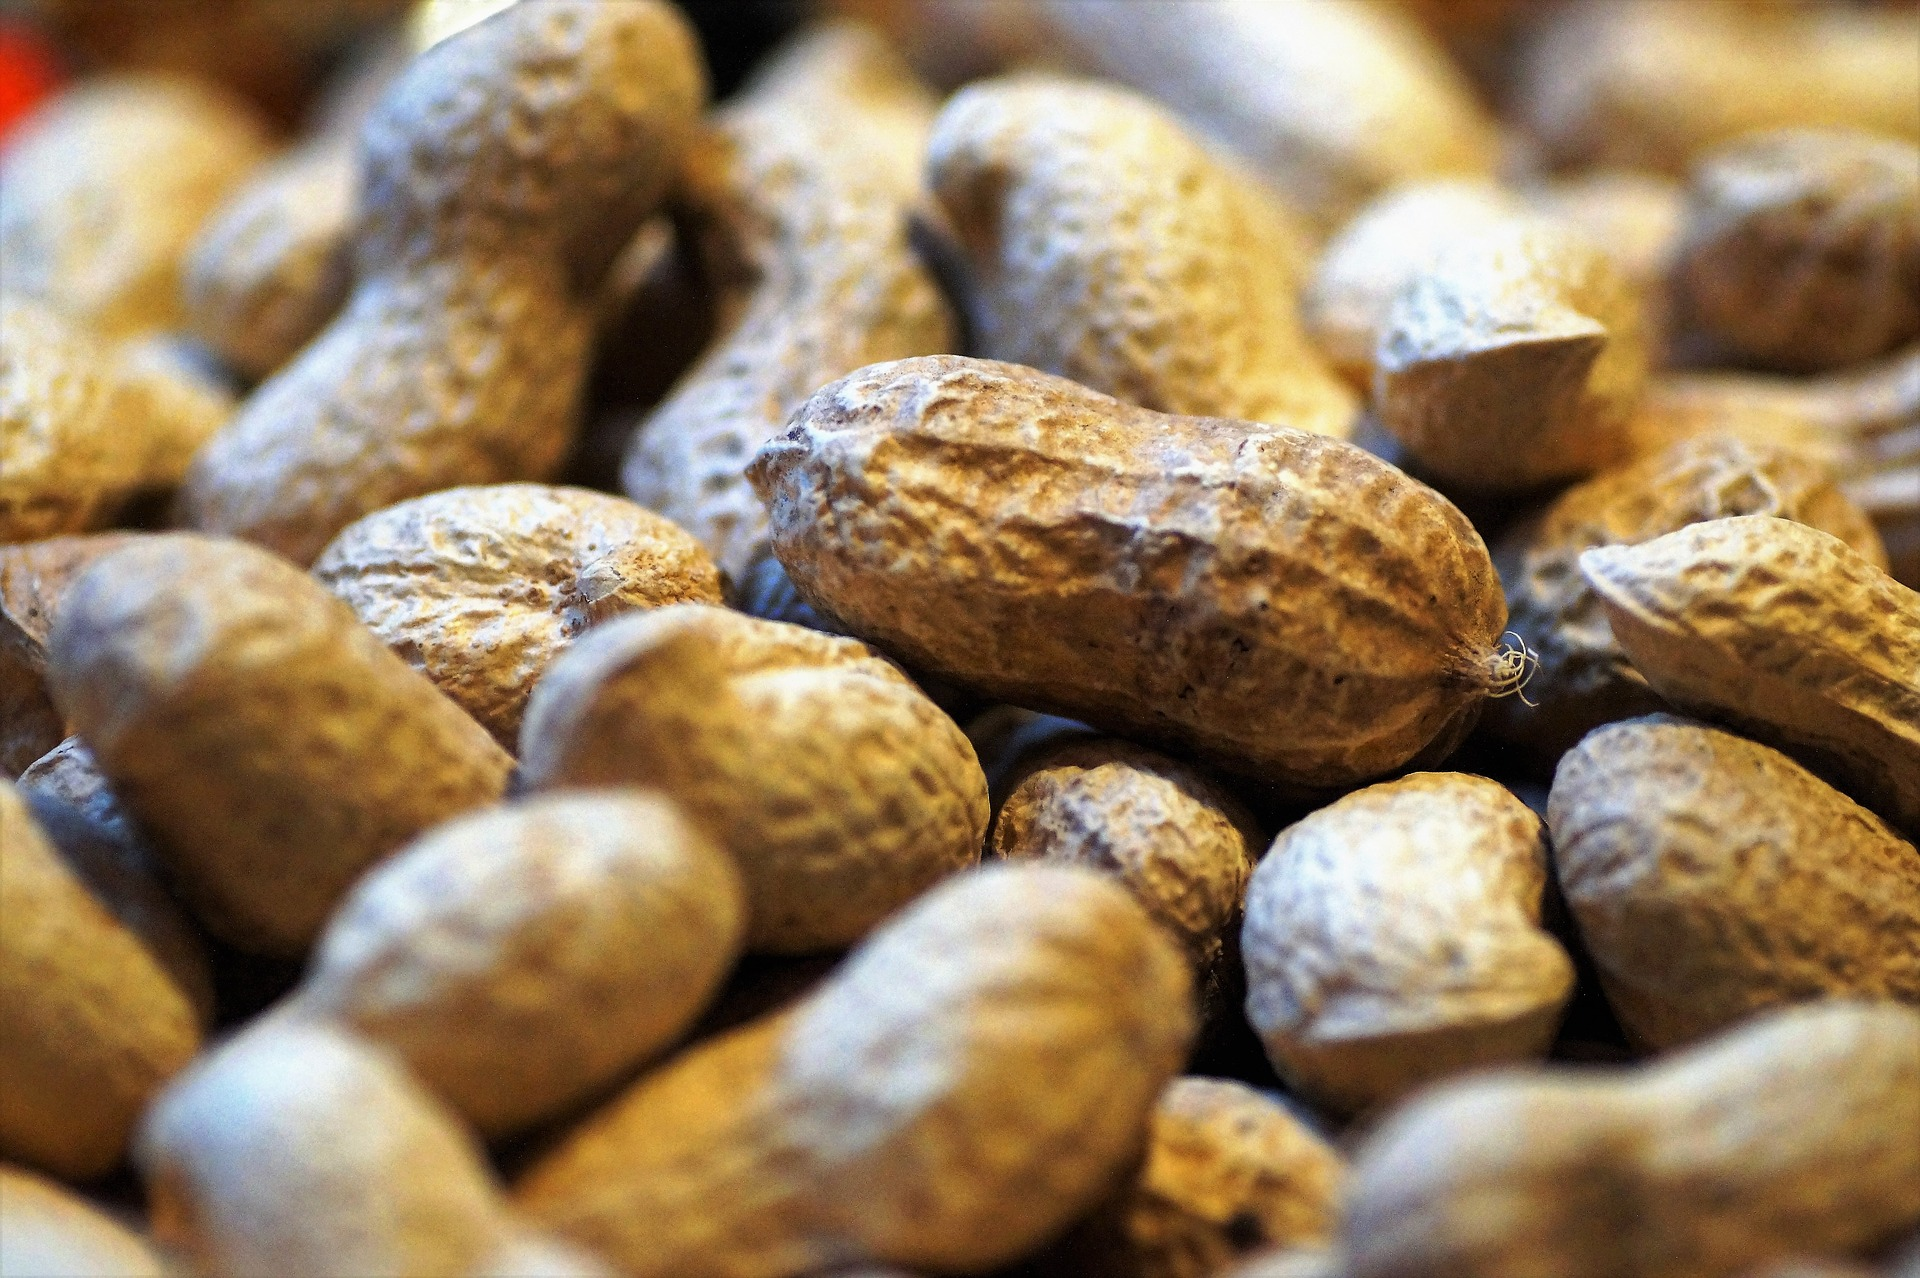 Unshelled Peanuts